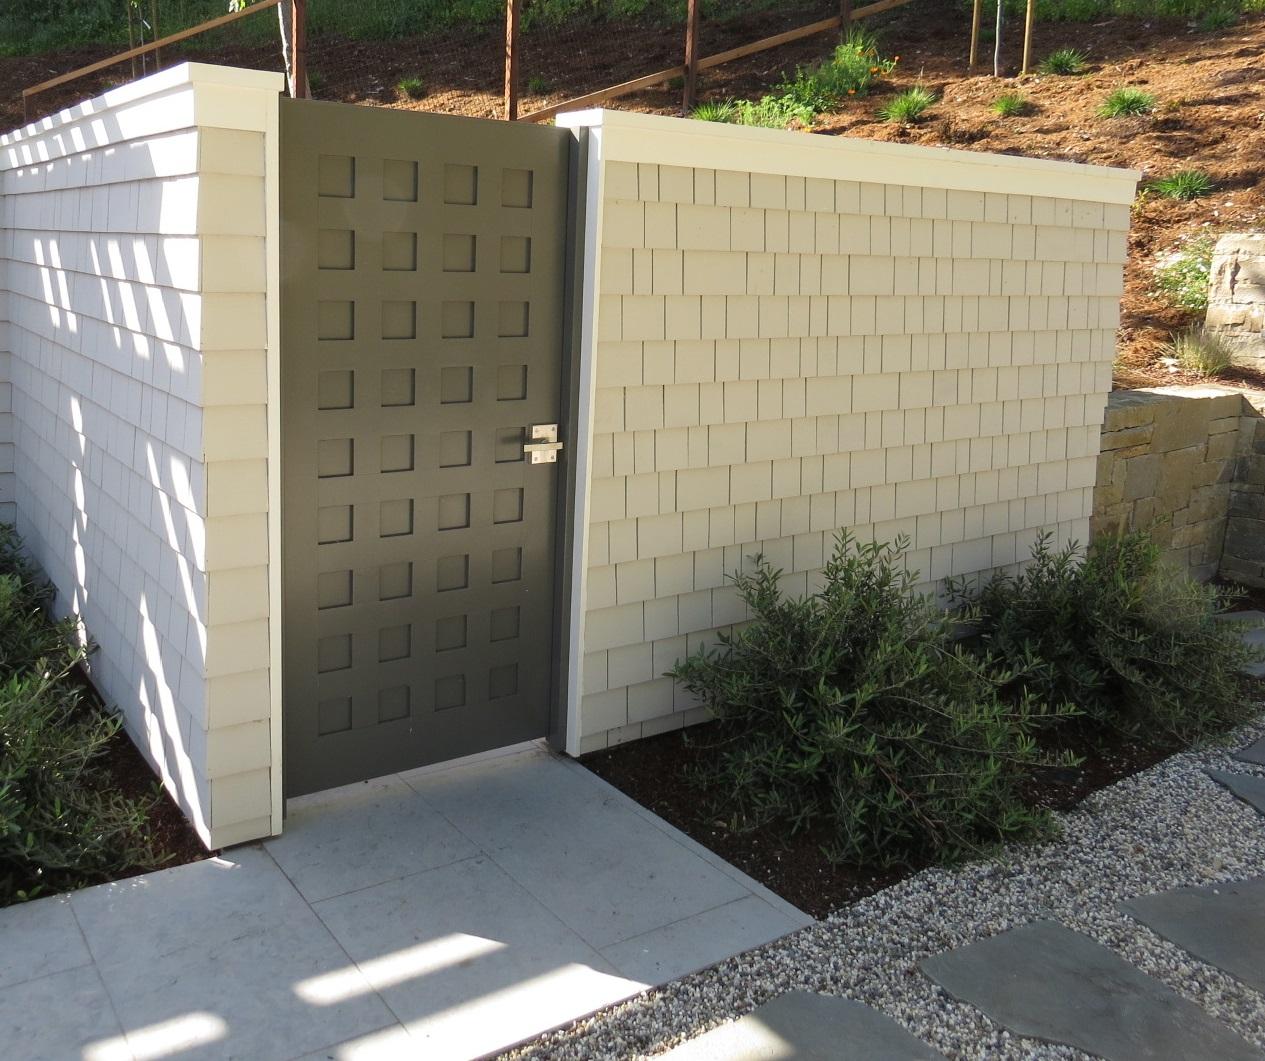 pool-dressing-area-door-with-stainless-steel-modern-alta-gate-latch.jpg